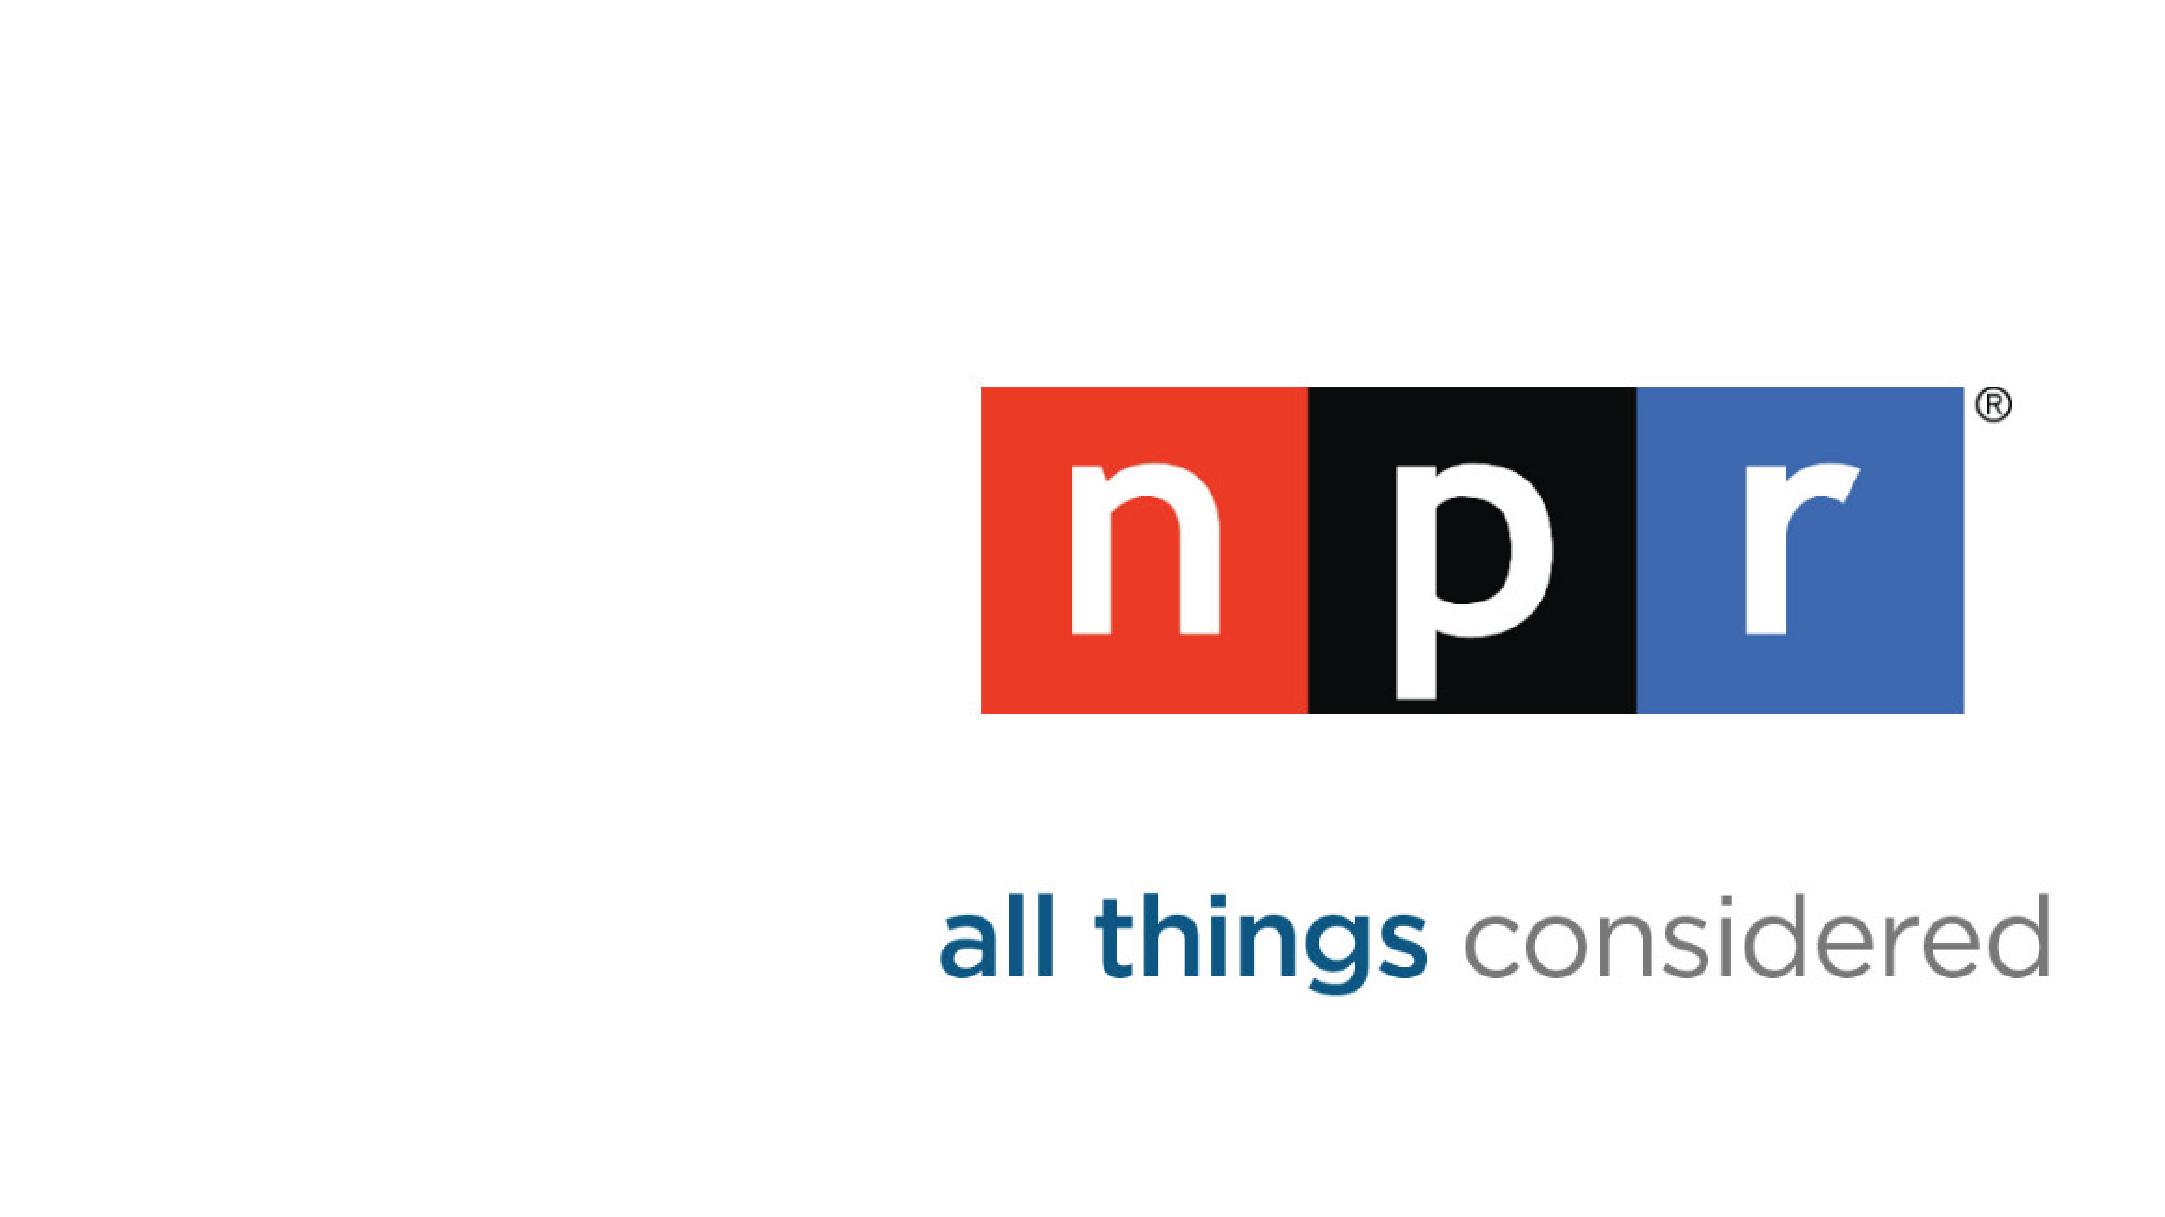 Design Director Talks Political Branding with NPR